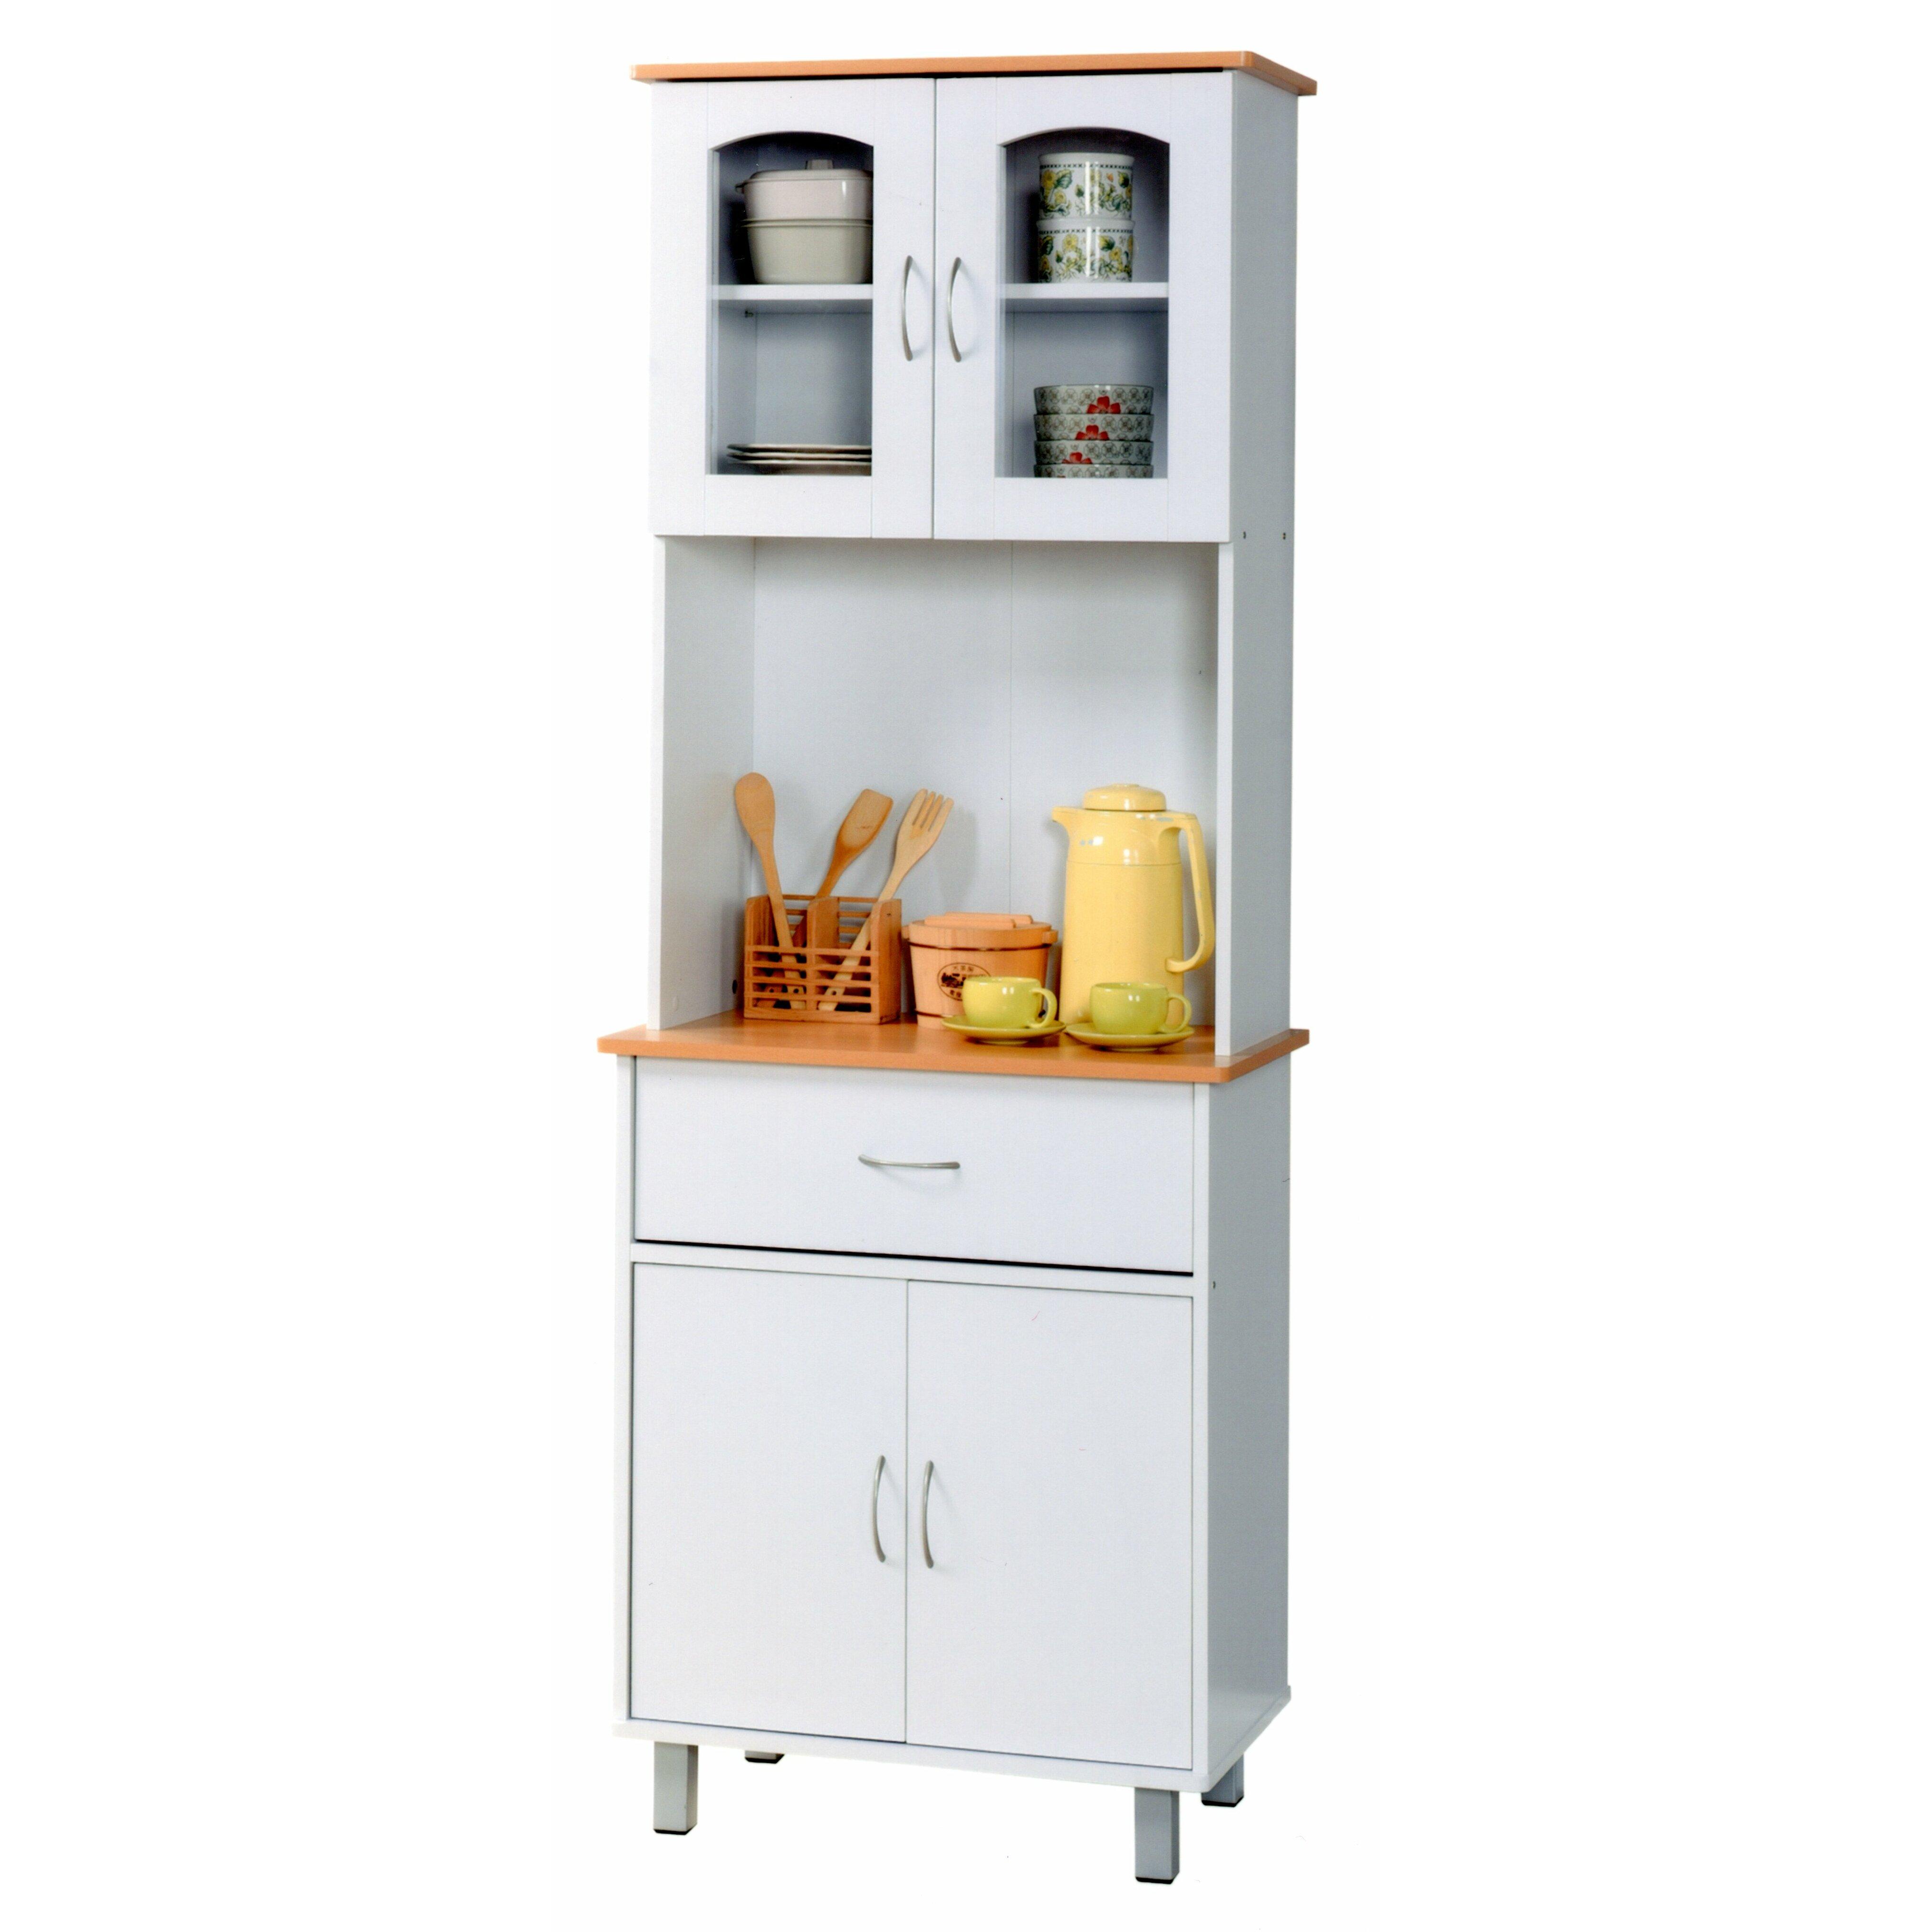 Hodedah china cabinet reviews wayfair for China kitchen cabinets